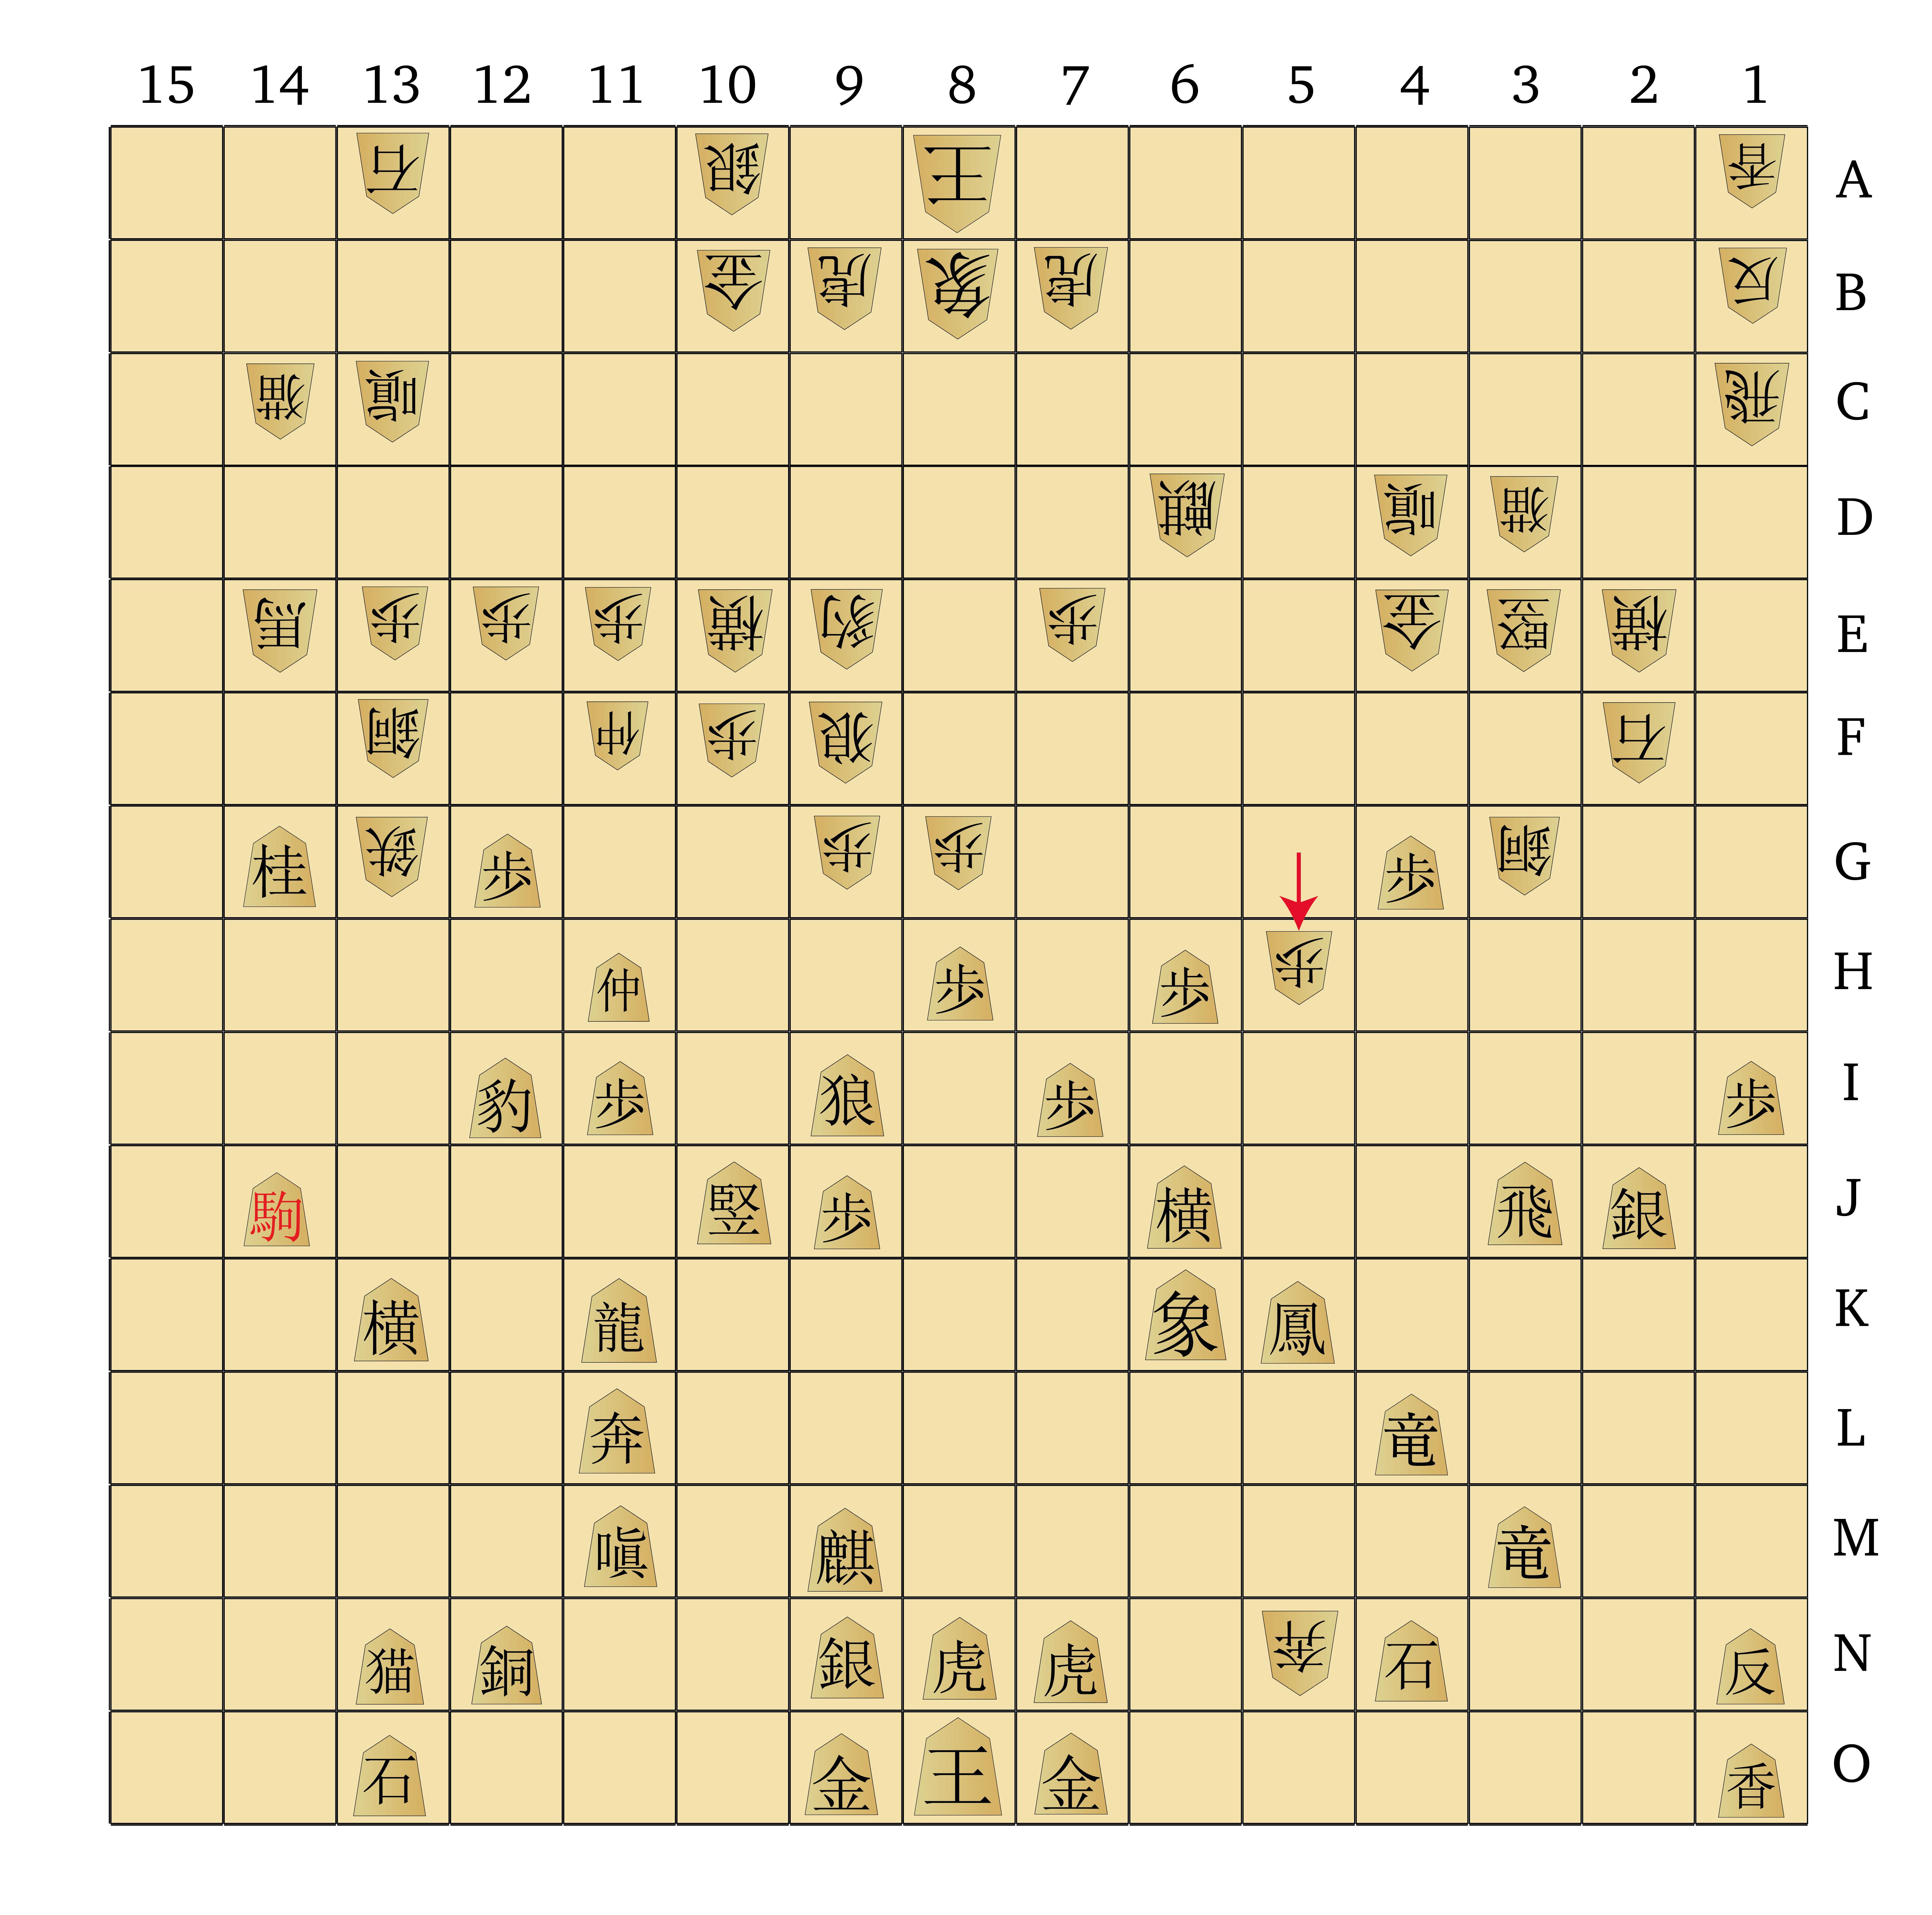 Dai Shogi 420 -- Move 360-01